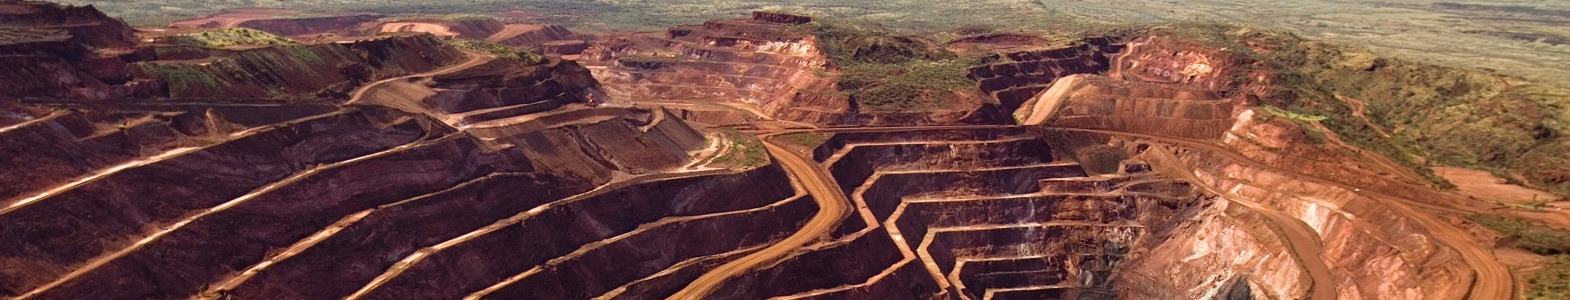 Innovation-in-mining mongolia